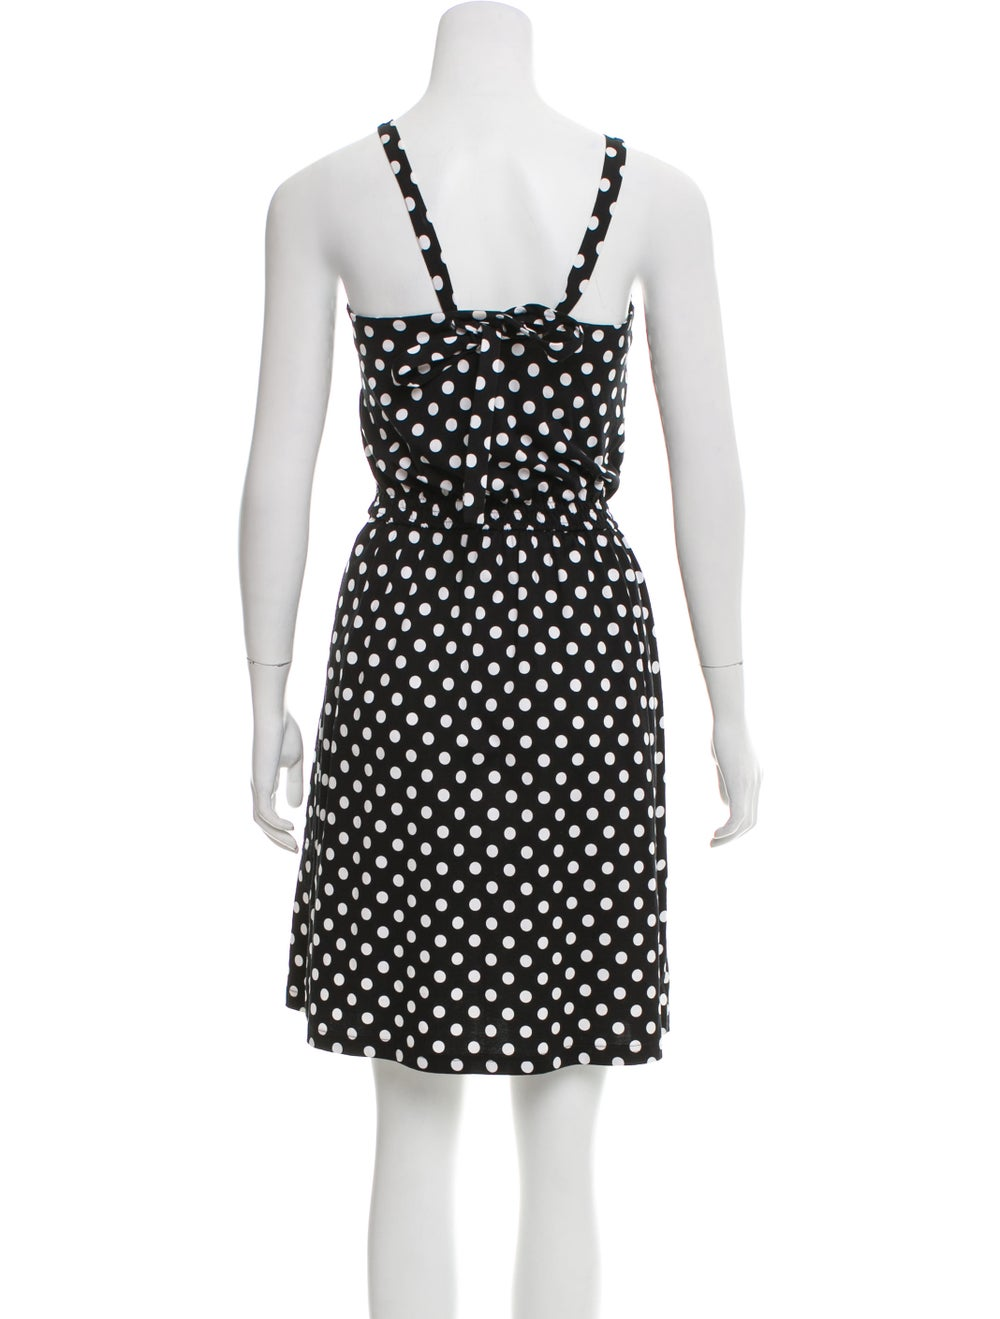 Marimekko Sleeveless Polka Dot Dress Black - image 3